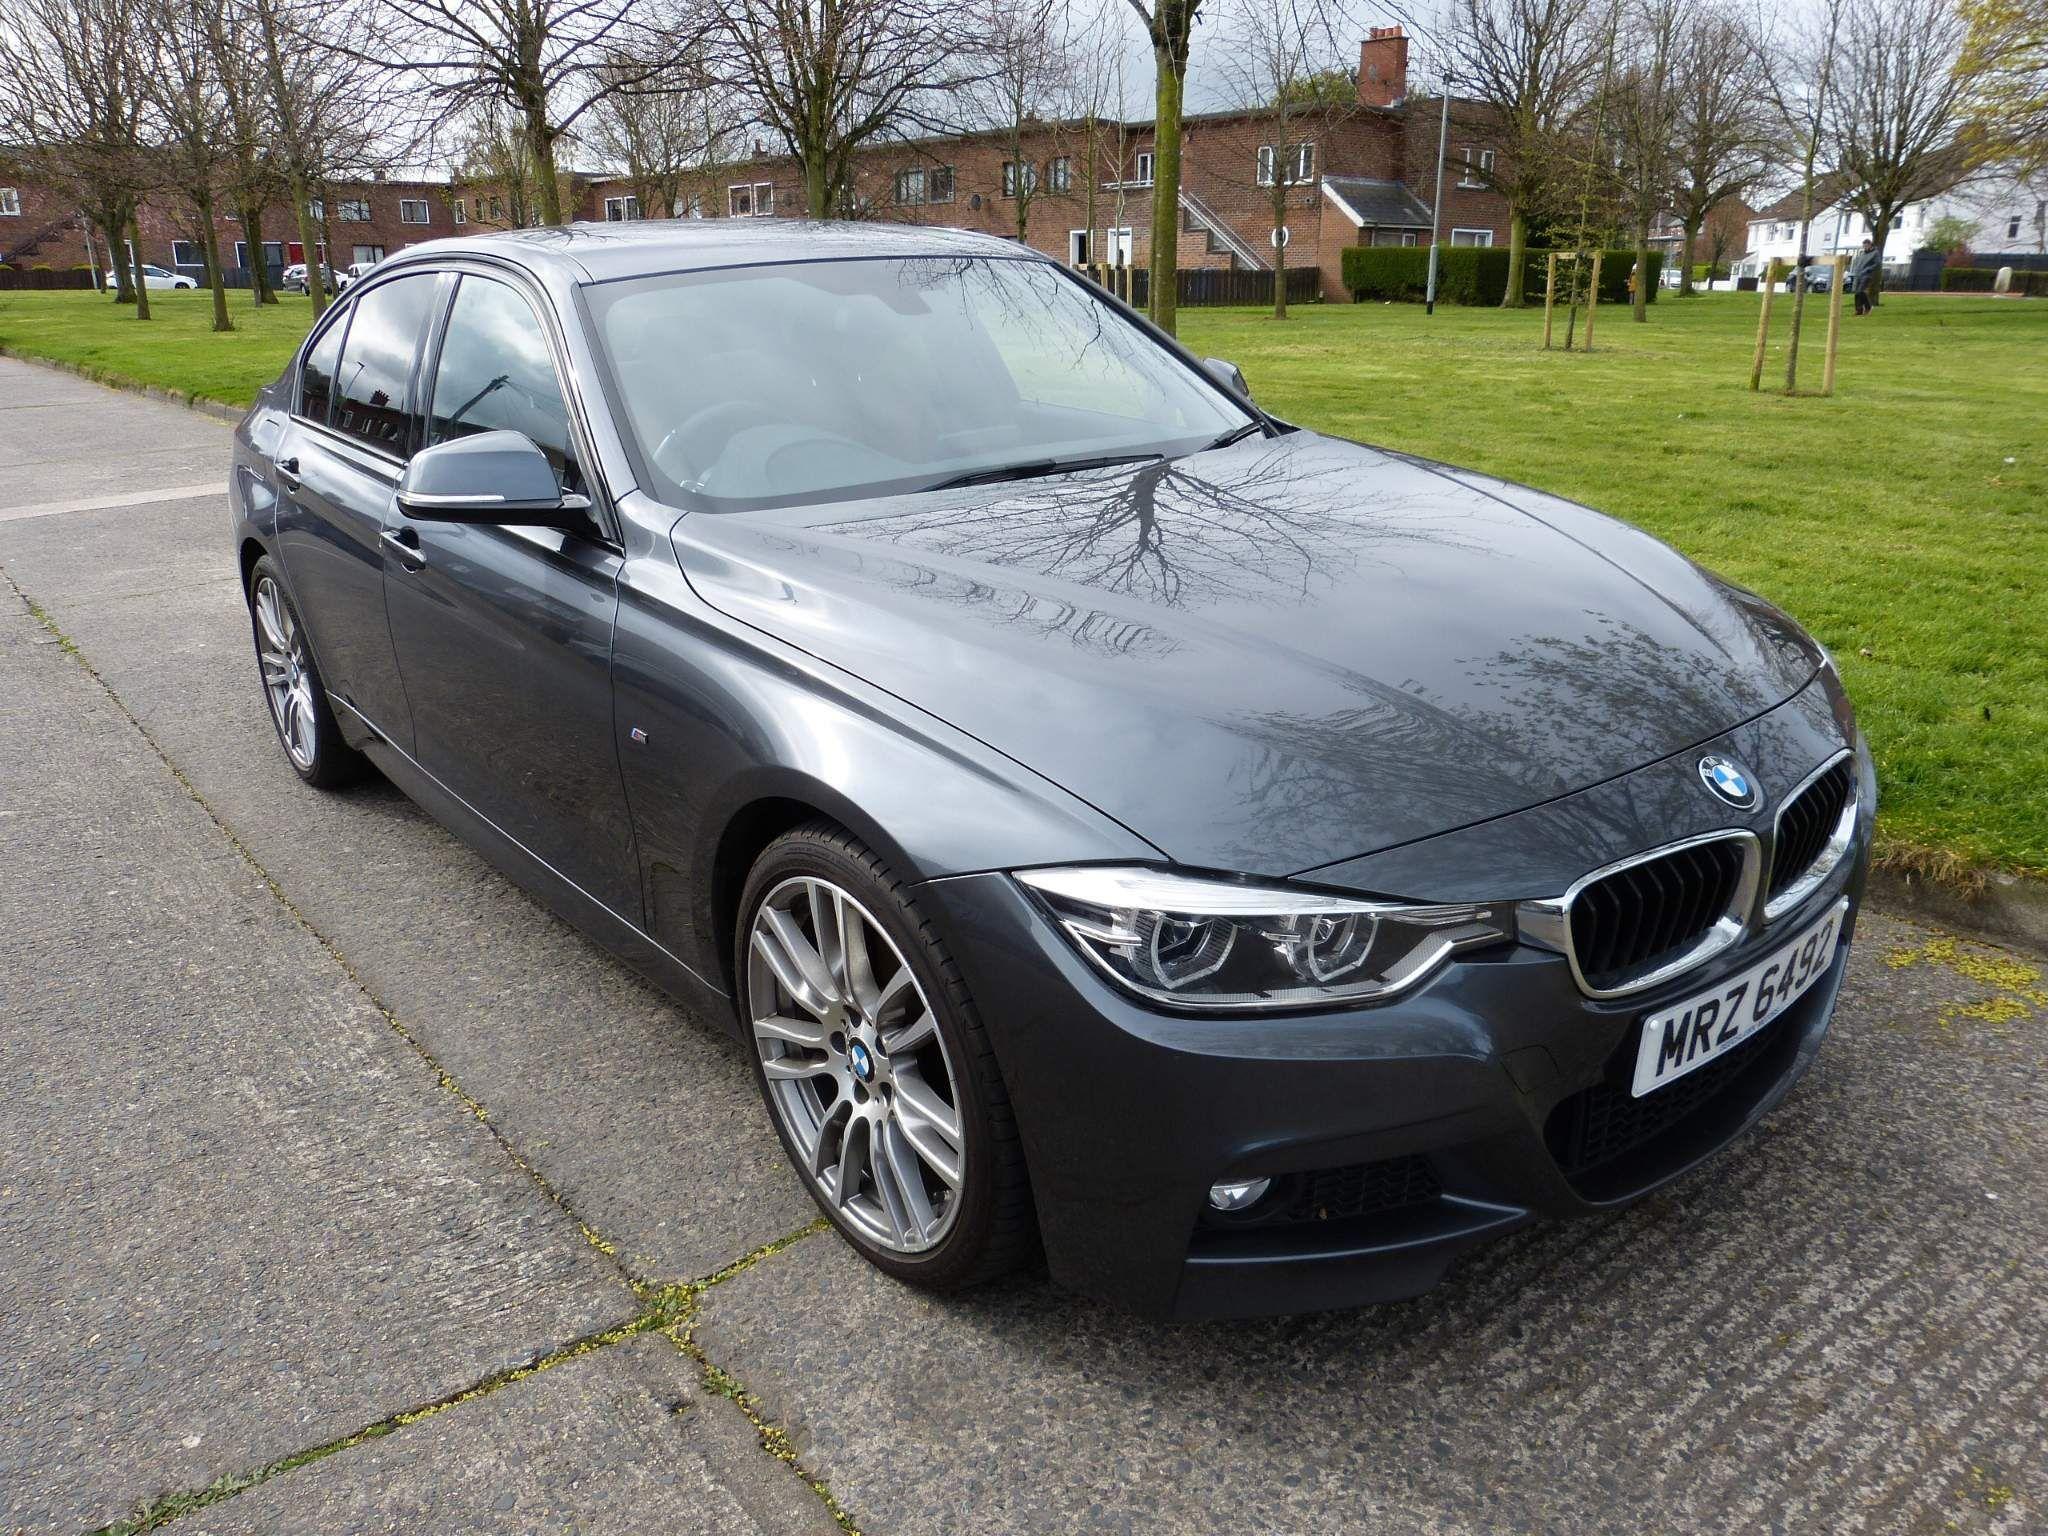 2017 BMW 3 Series 2.0 320d BluePerformance M Sport Auto (s/s) Diesel Automatic  – Beechlawn Motors Belfast